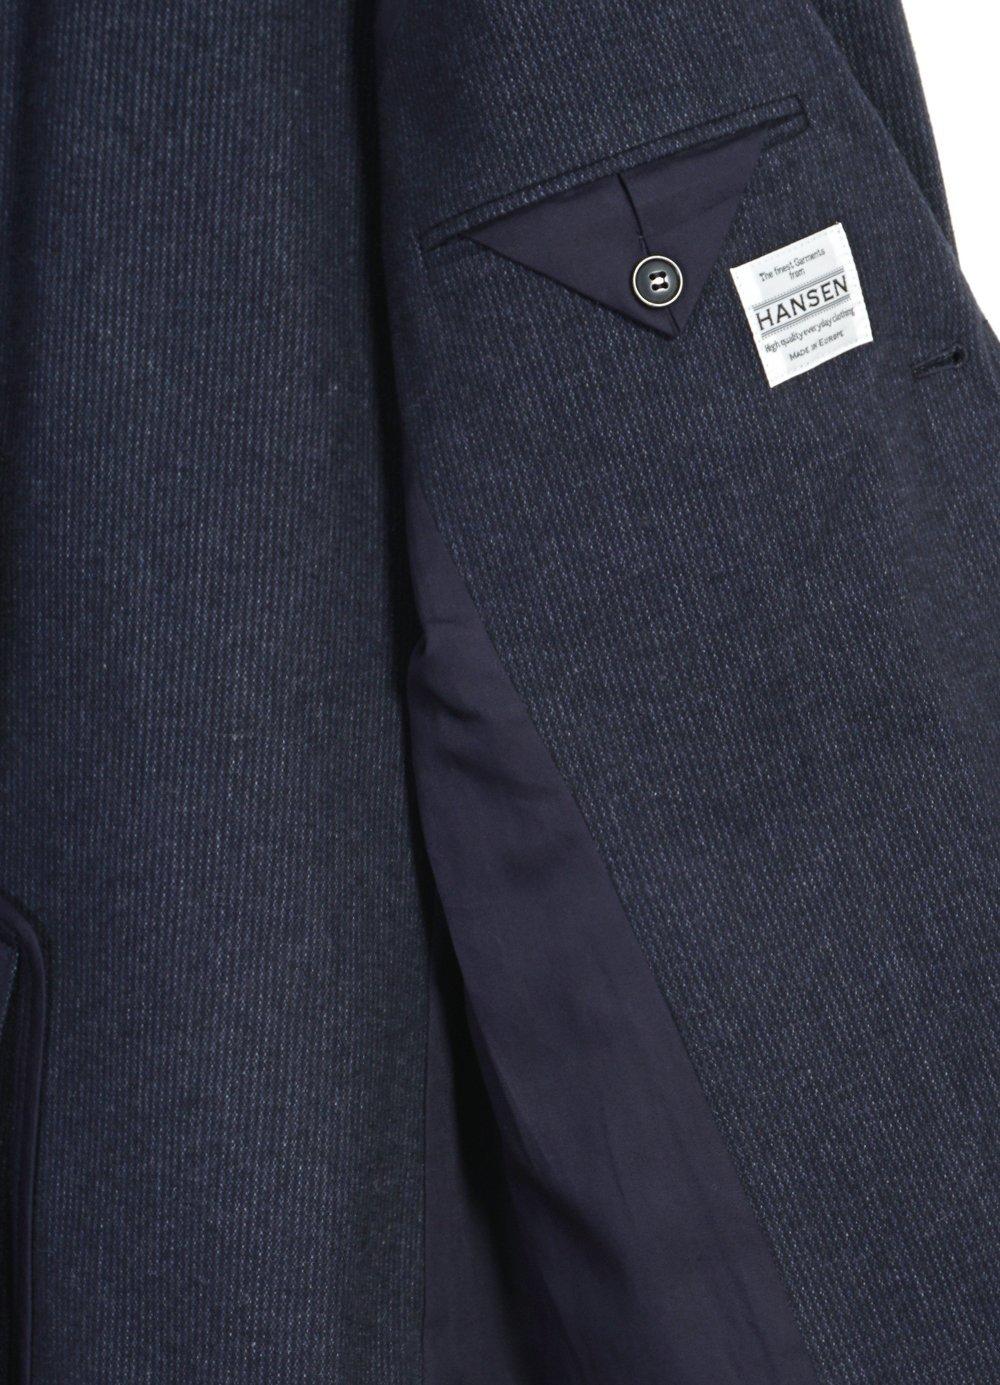 Hansen Garments CHRIS | Classic Two Button Classic Blazer | brushed blue